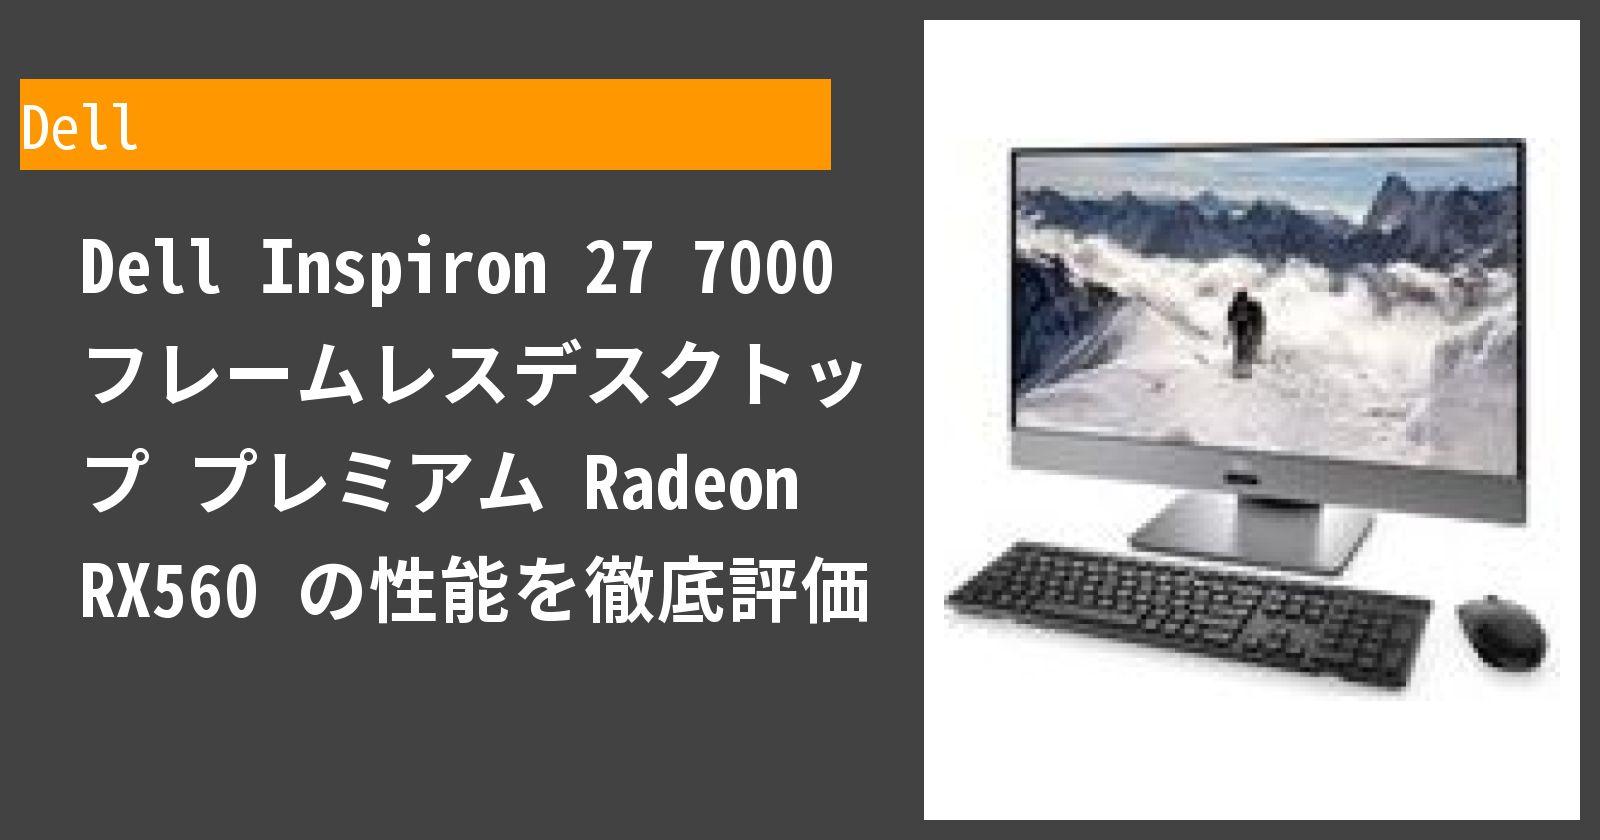 Dell Inspiron 27(Radeon RX560) の性能を徹底評価